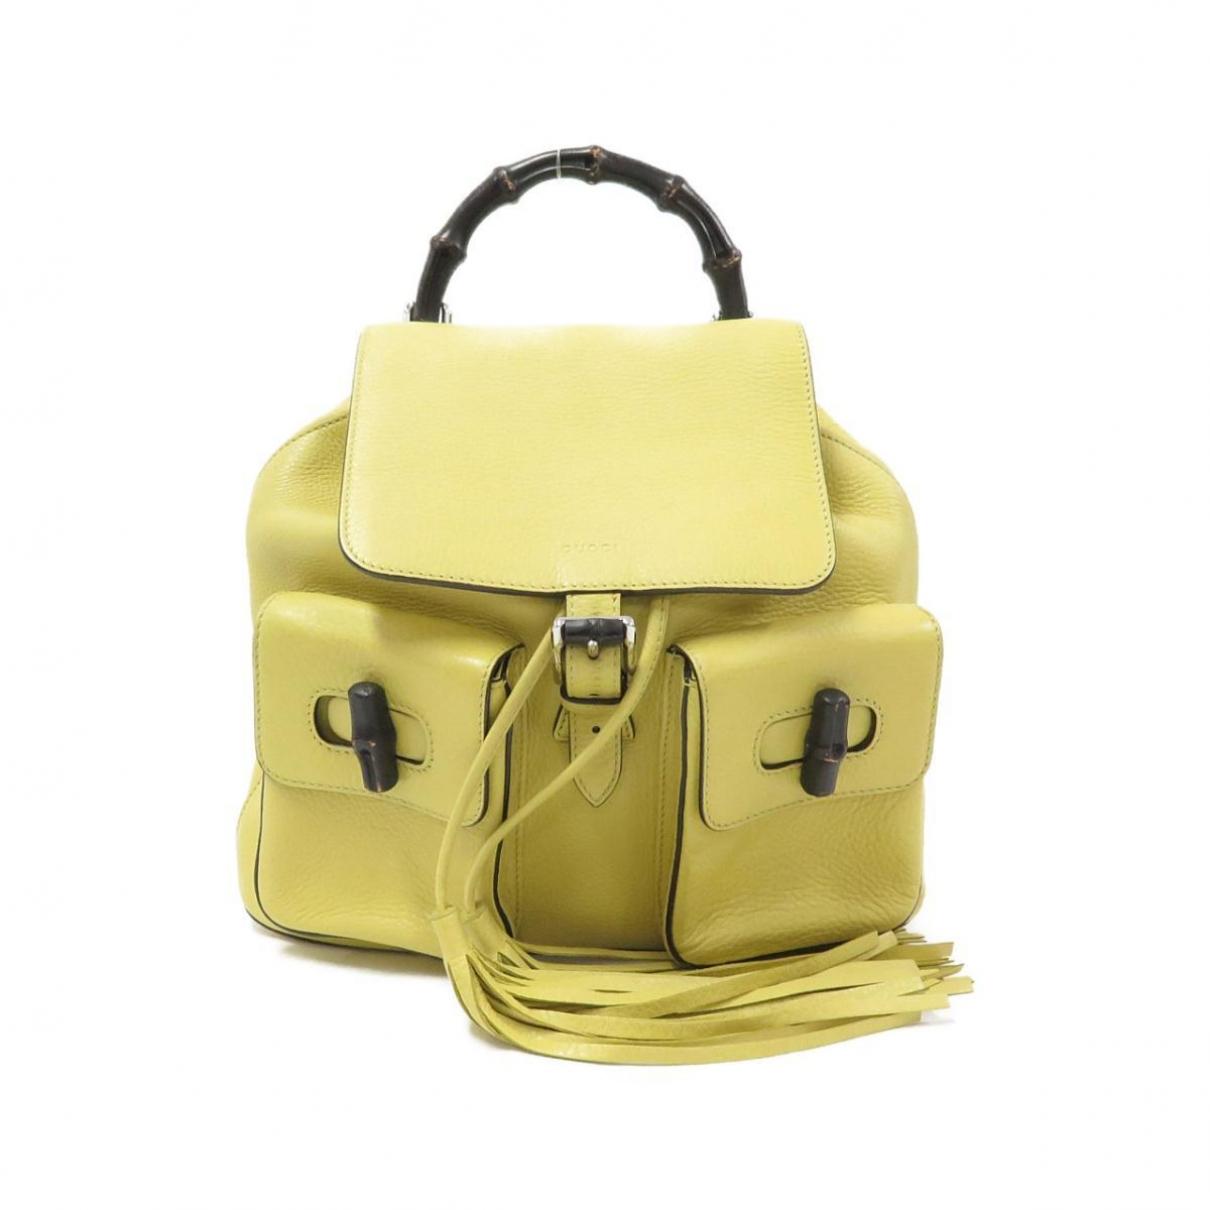 Gucci - Sac a dos Bamboo pour femme en cuir - jaune